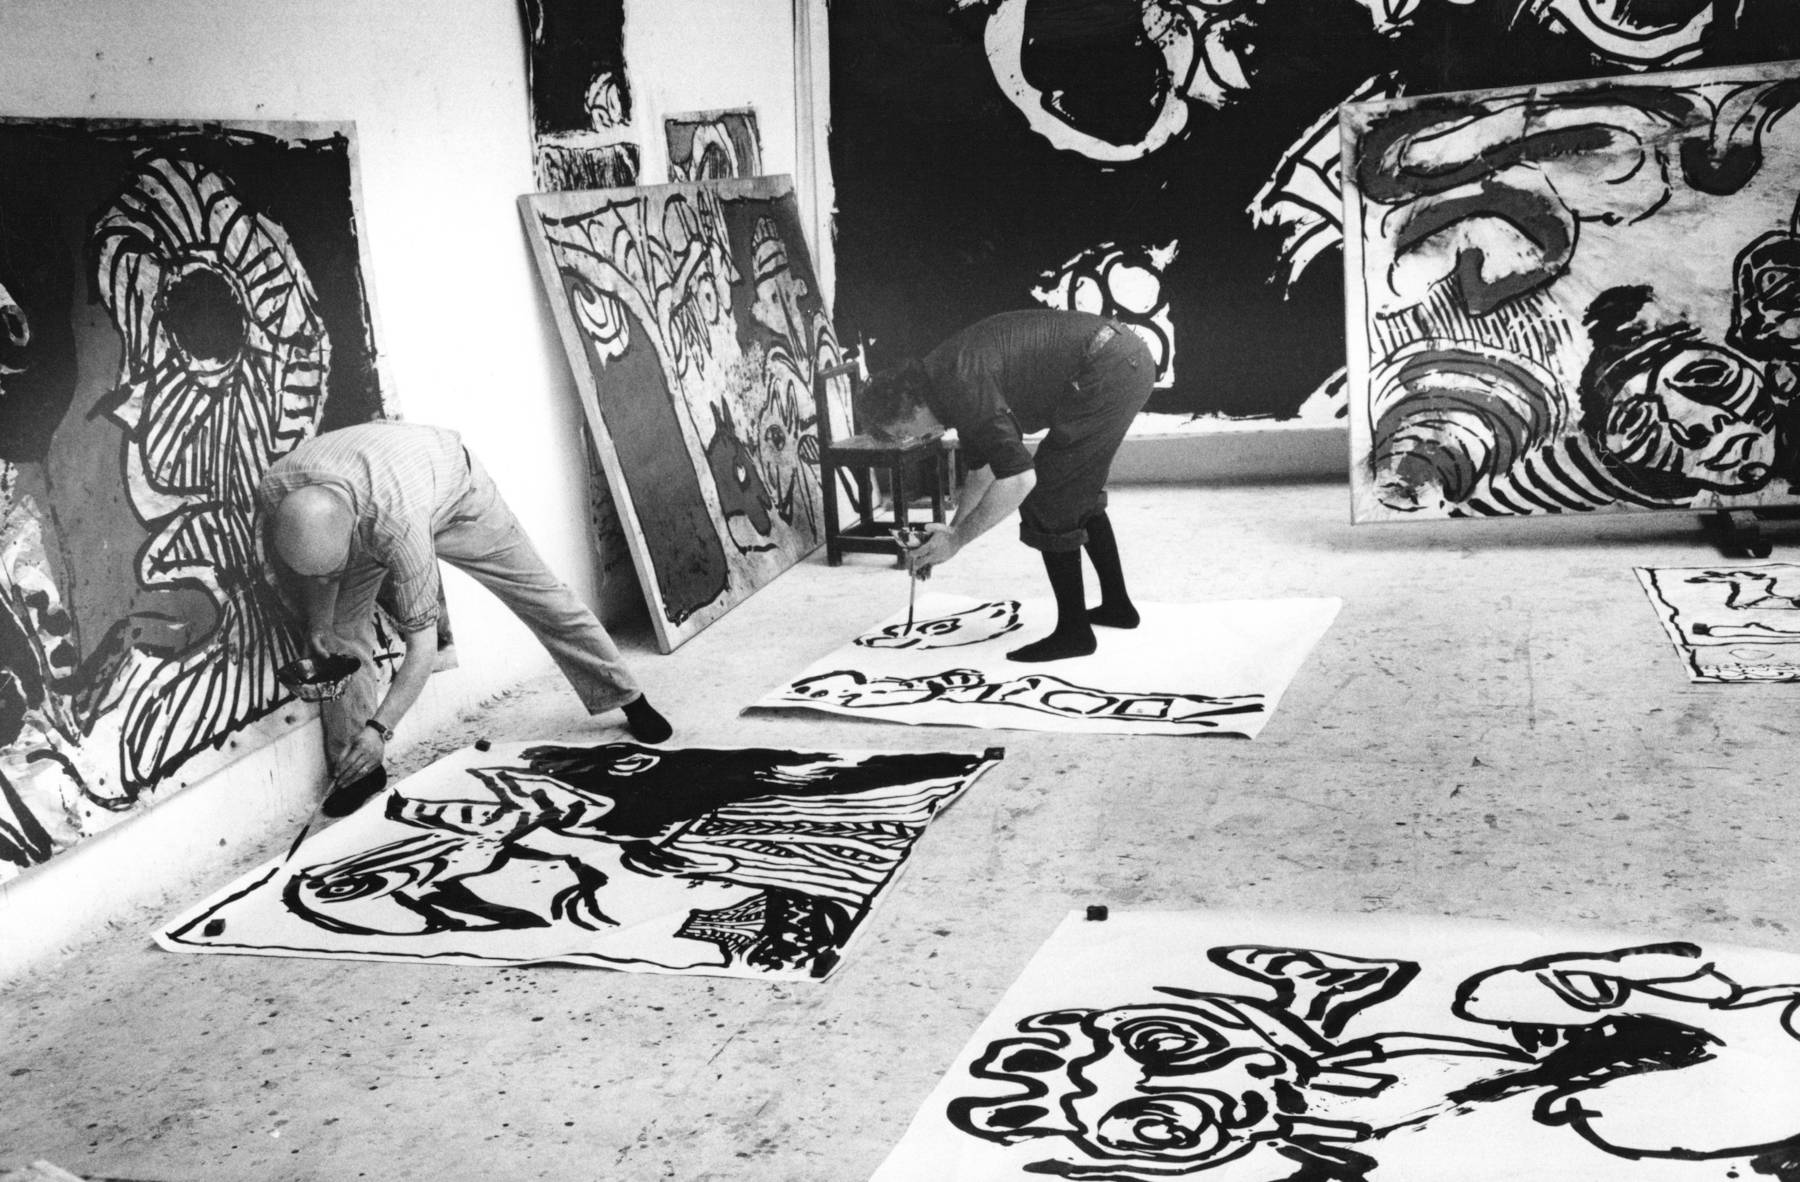 Galerie Lelong Appel Alechinsky